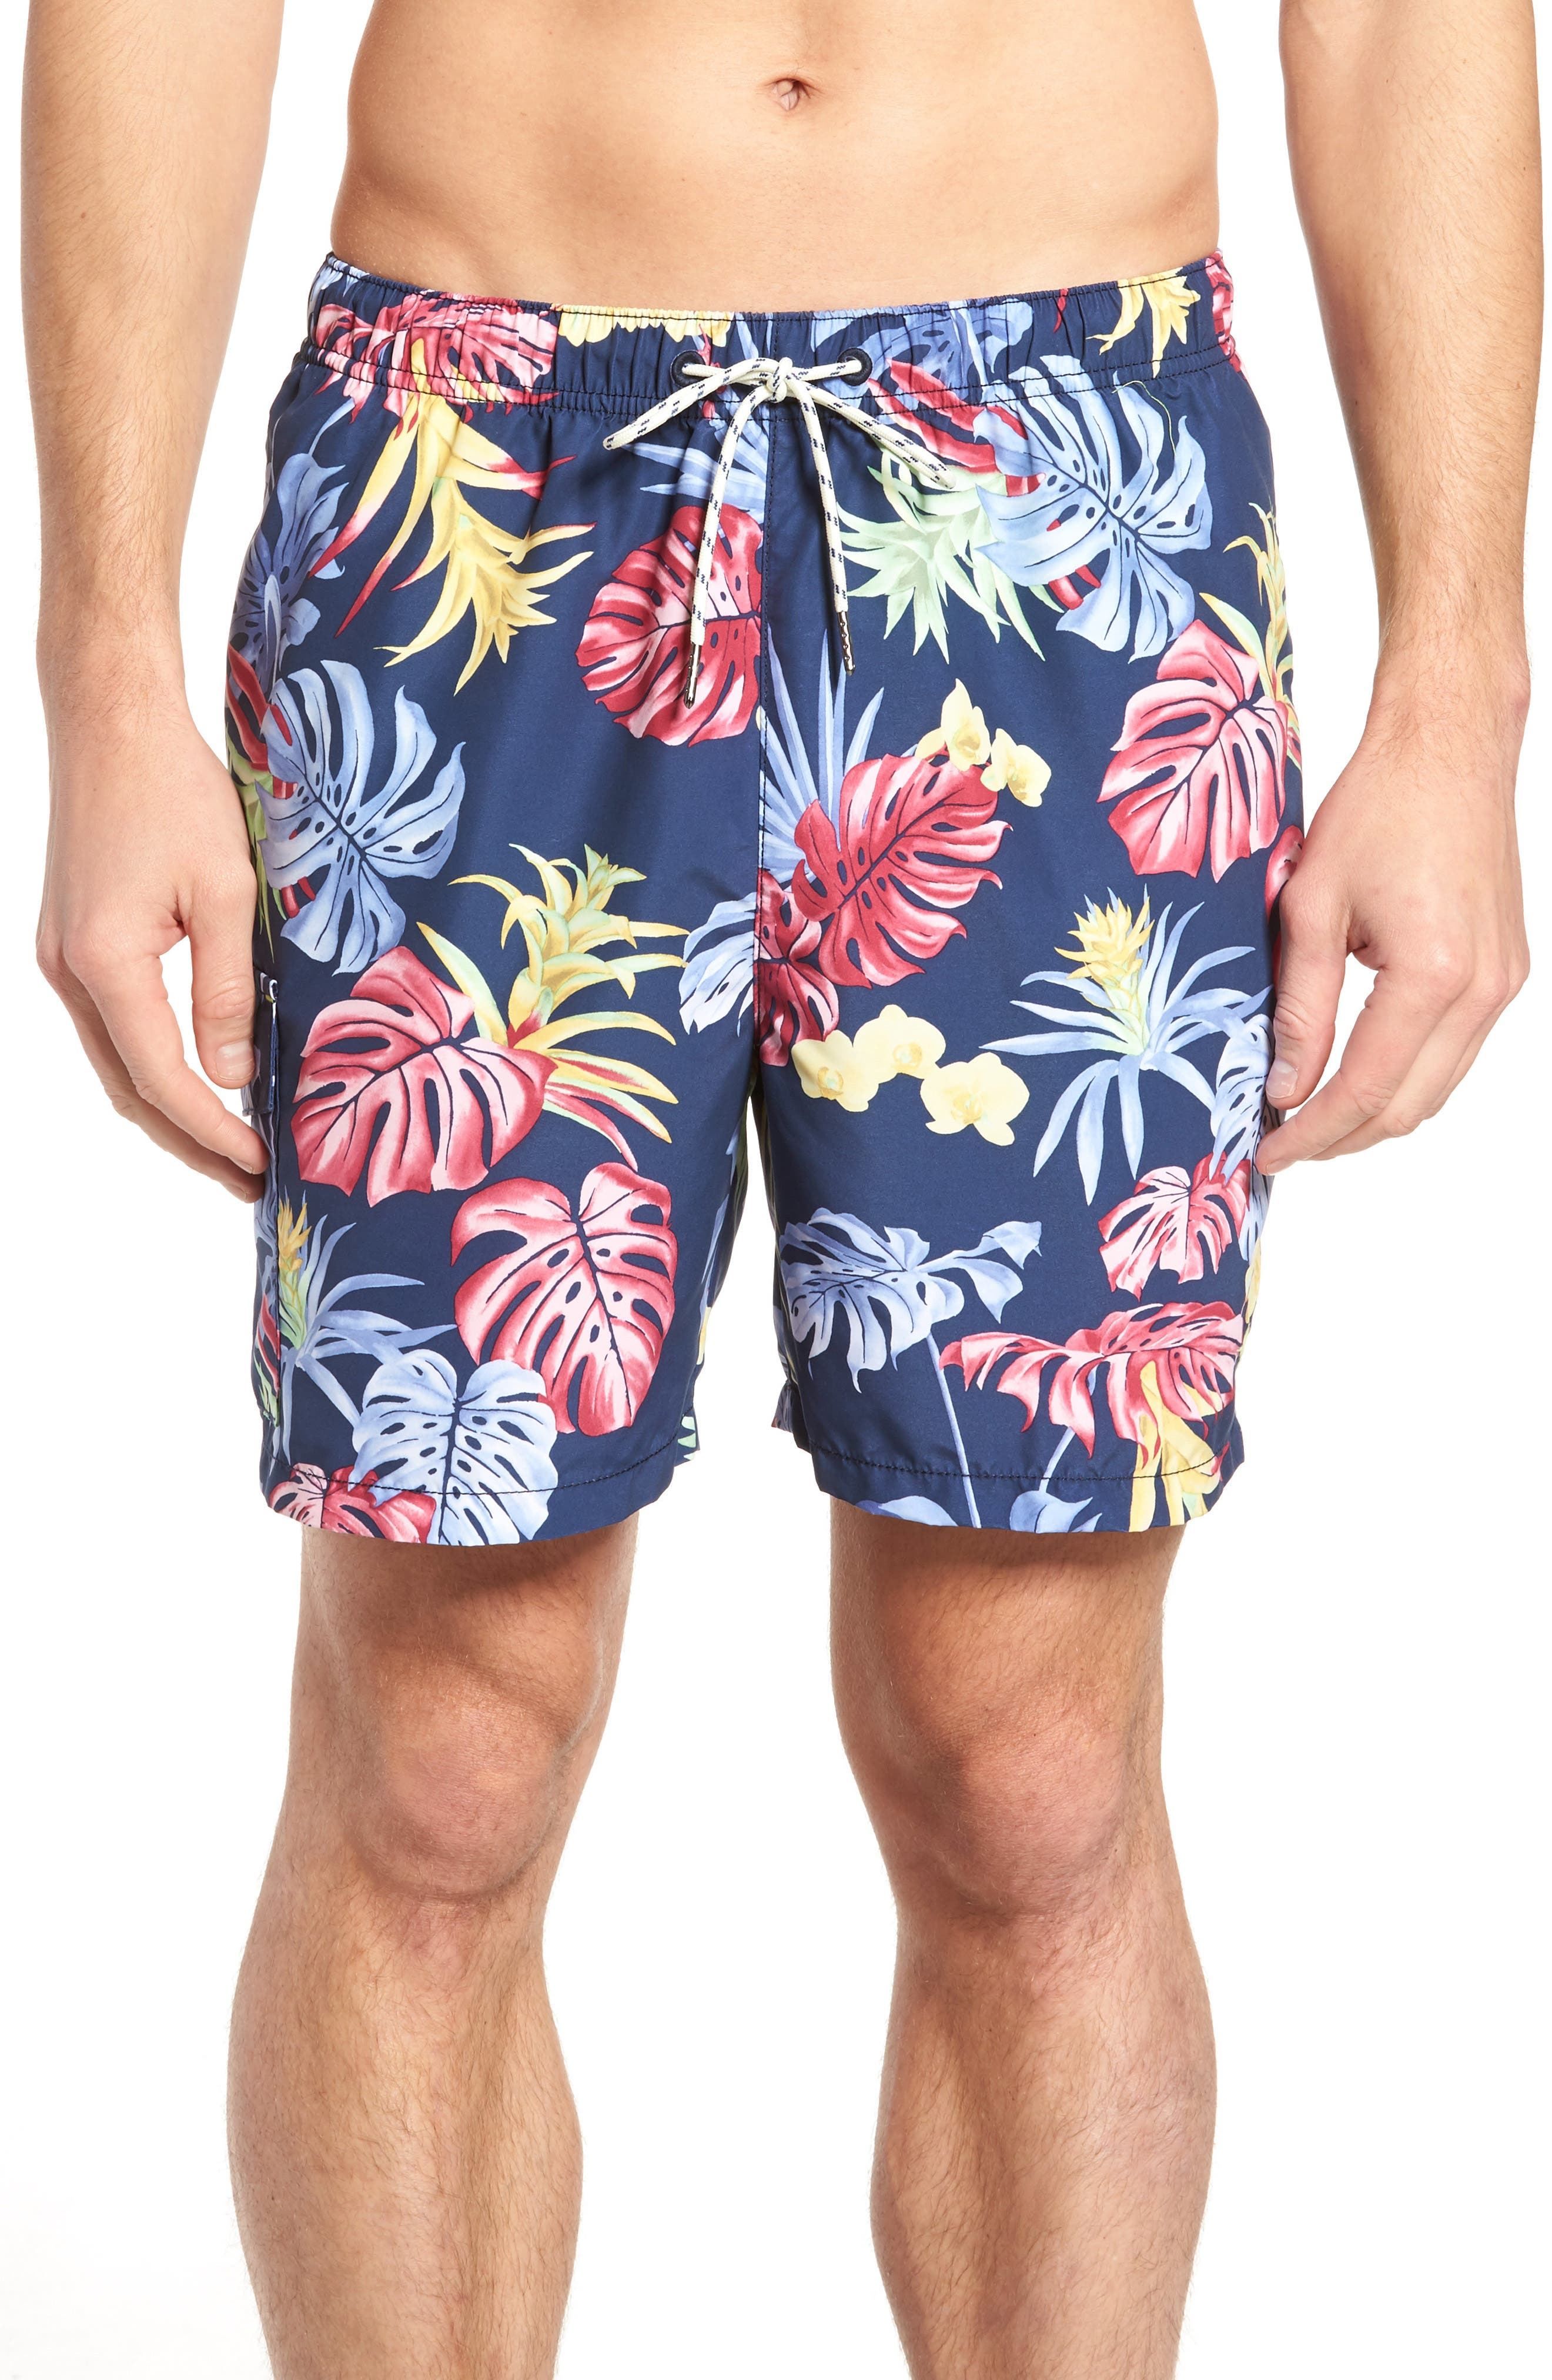 Naples Bogart Blooms Swim Trunks,                             Main thumbnail 1, color,                             Ocean Deep